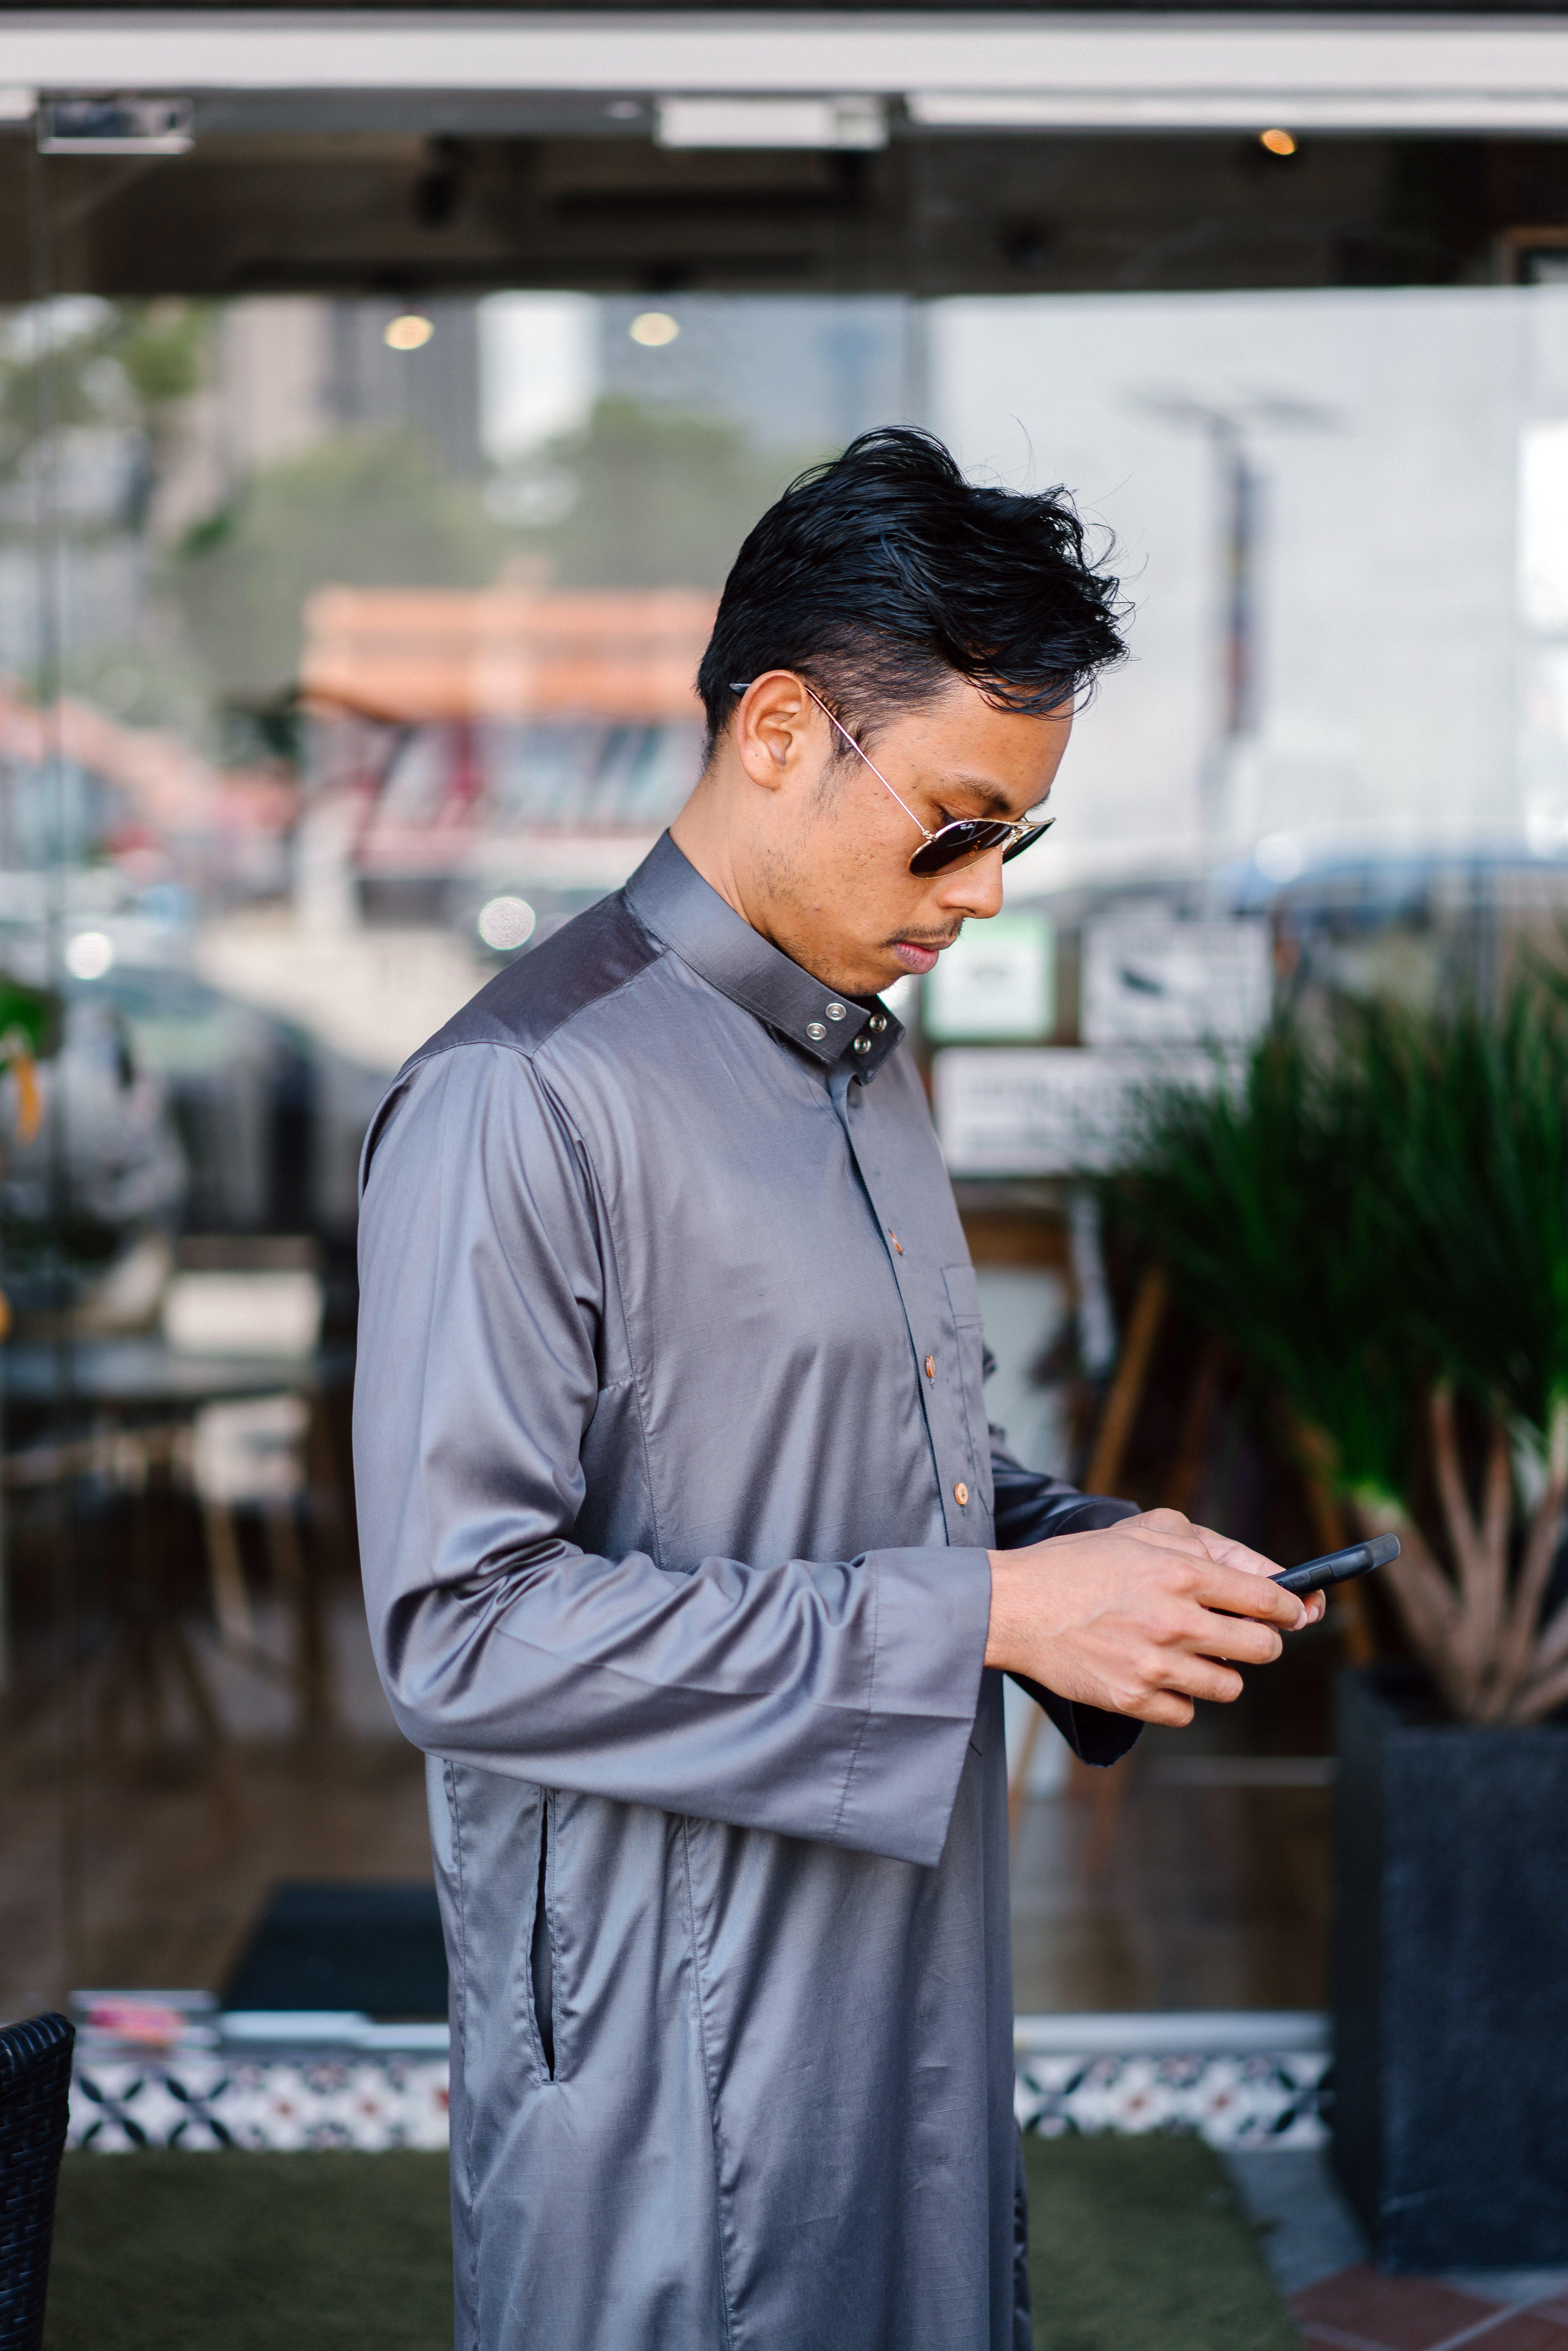 Man Wearing Gray Dress Shirt